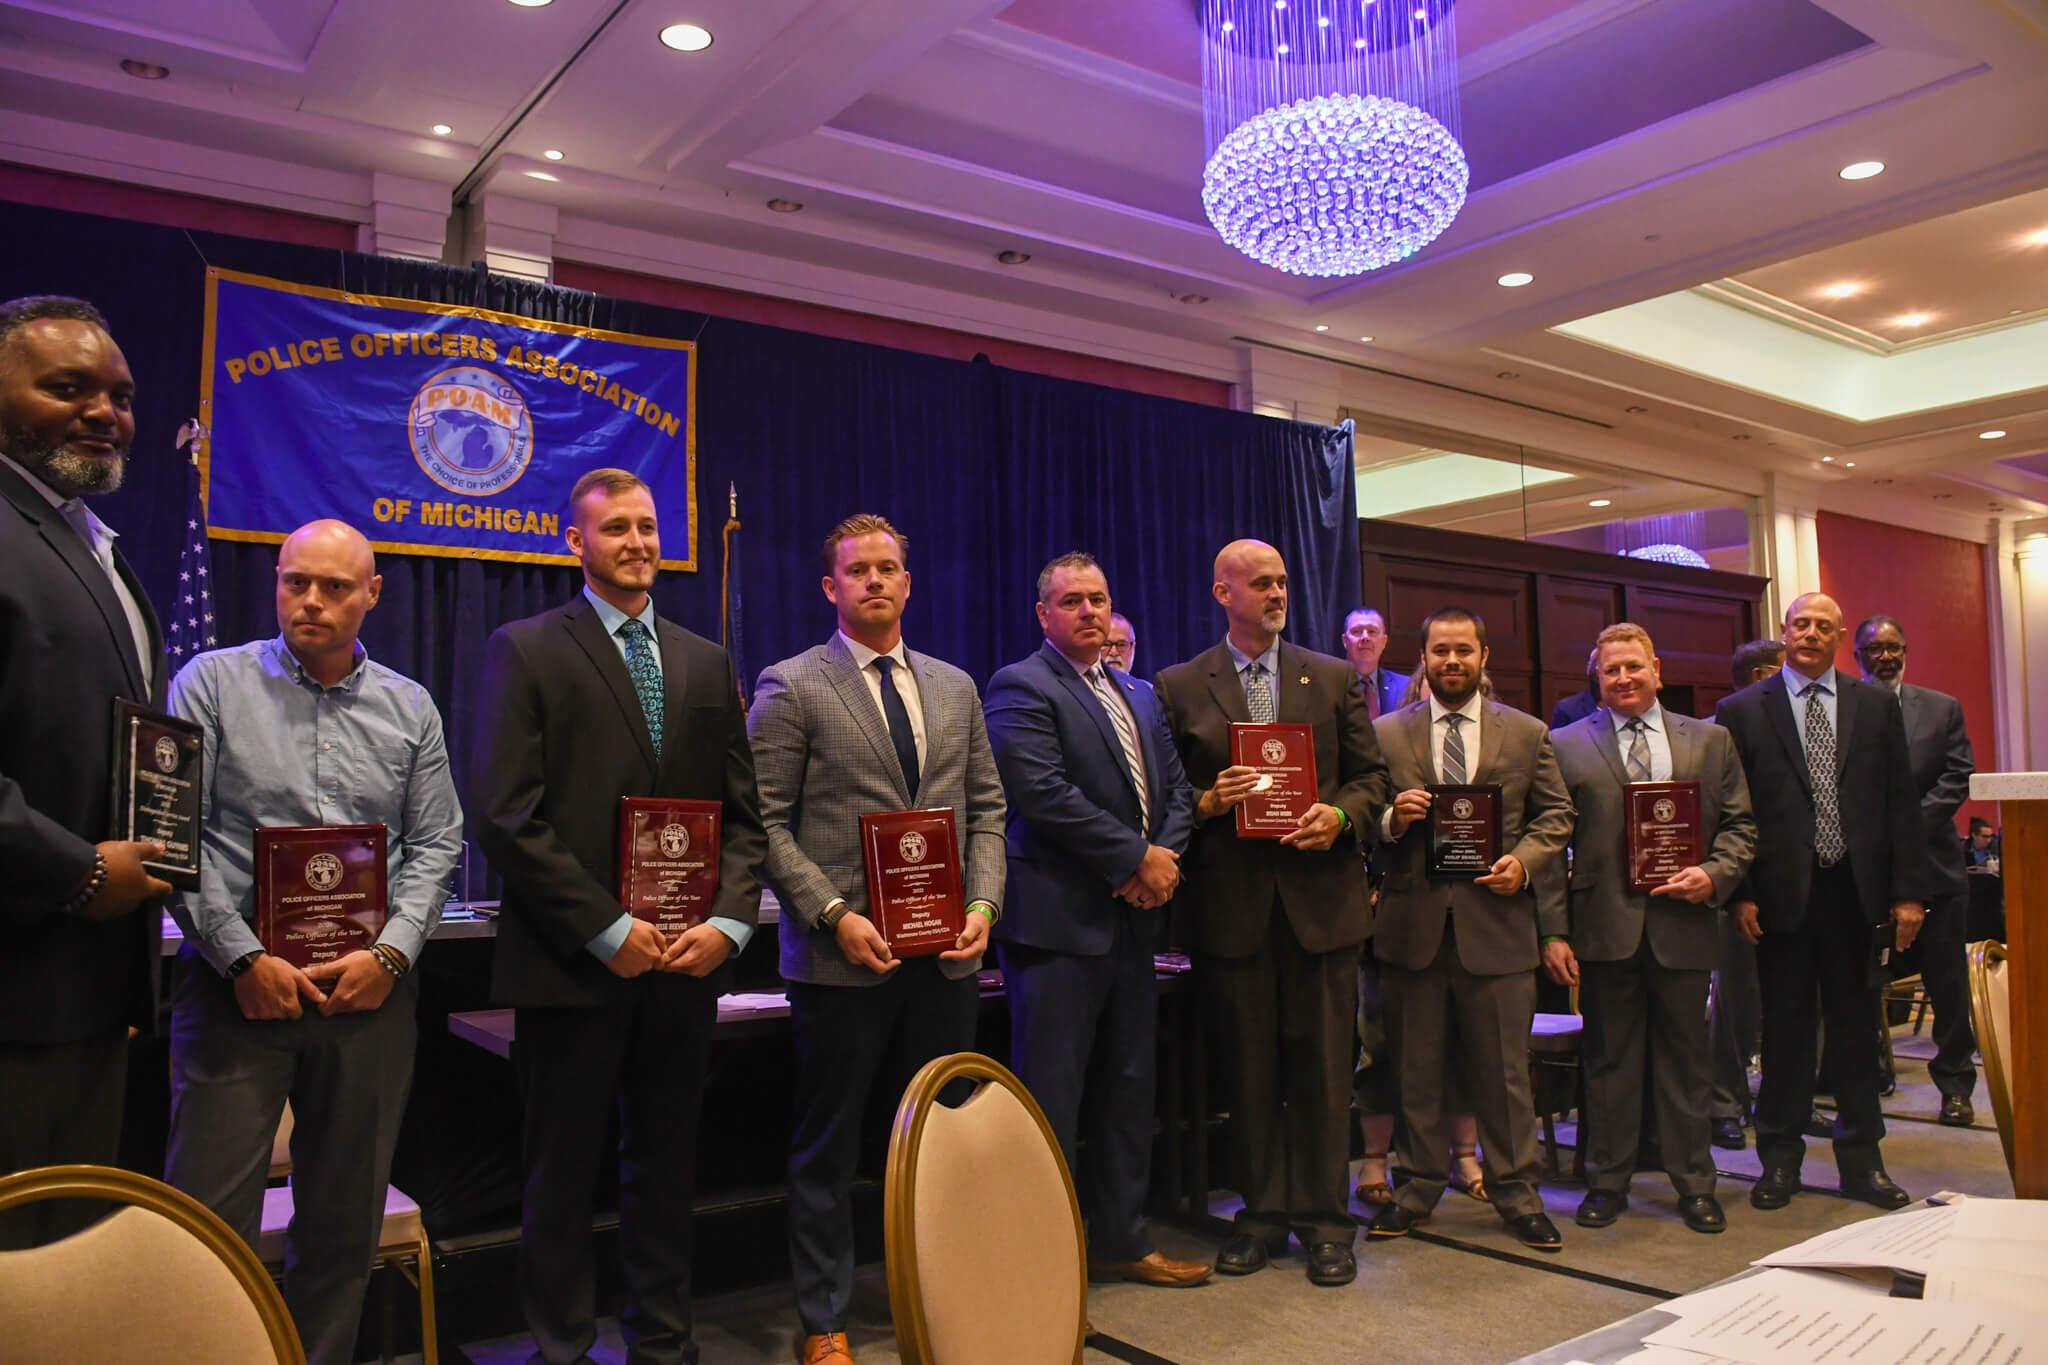 Washtenaw County Deputy Sheriffs Association Group photo